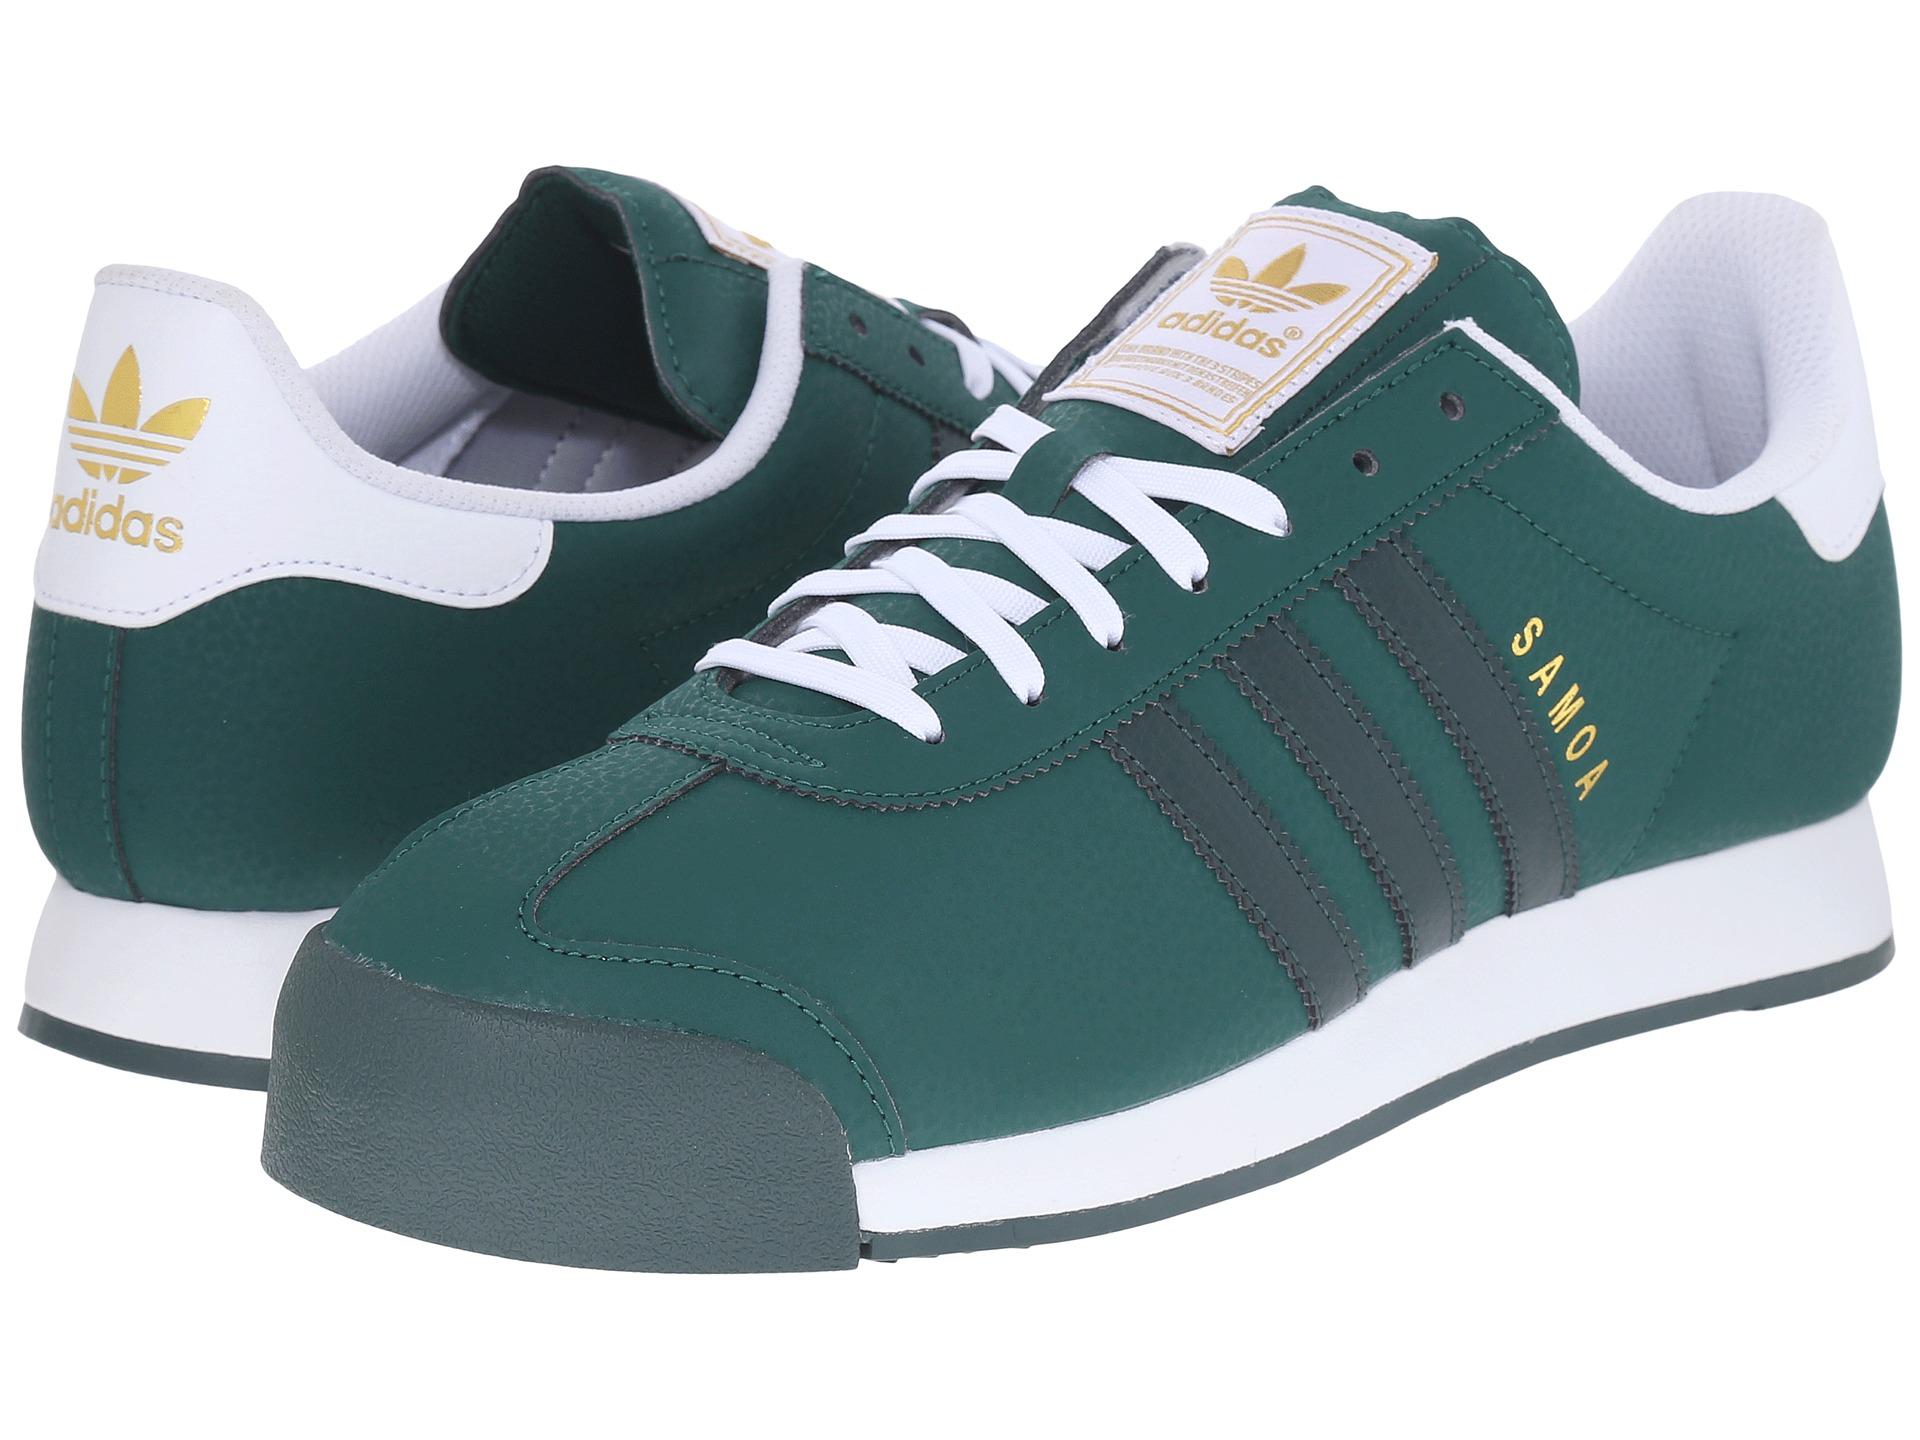 Adidas Samoa Retro Shoes